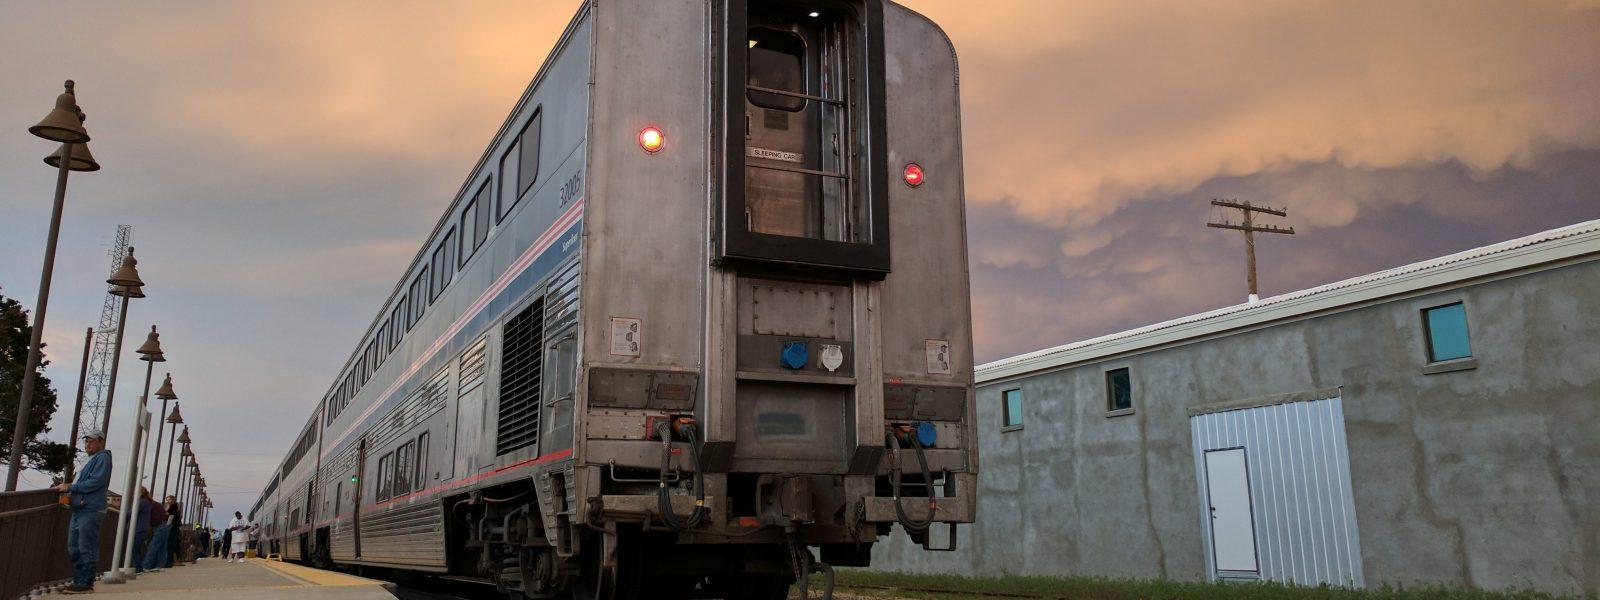 Amtrak's Texas Eagle: La To Dallas Trip Report – Parker's Travel Log - Amtrak Texas Eagle Route Map